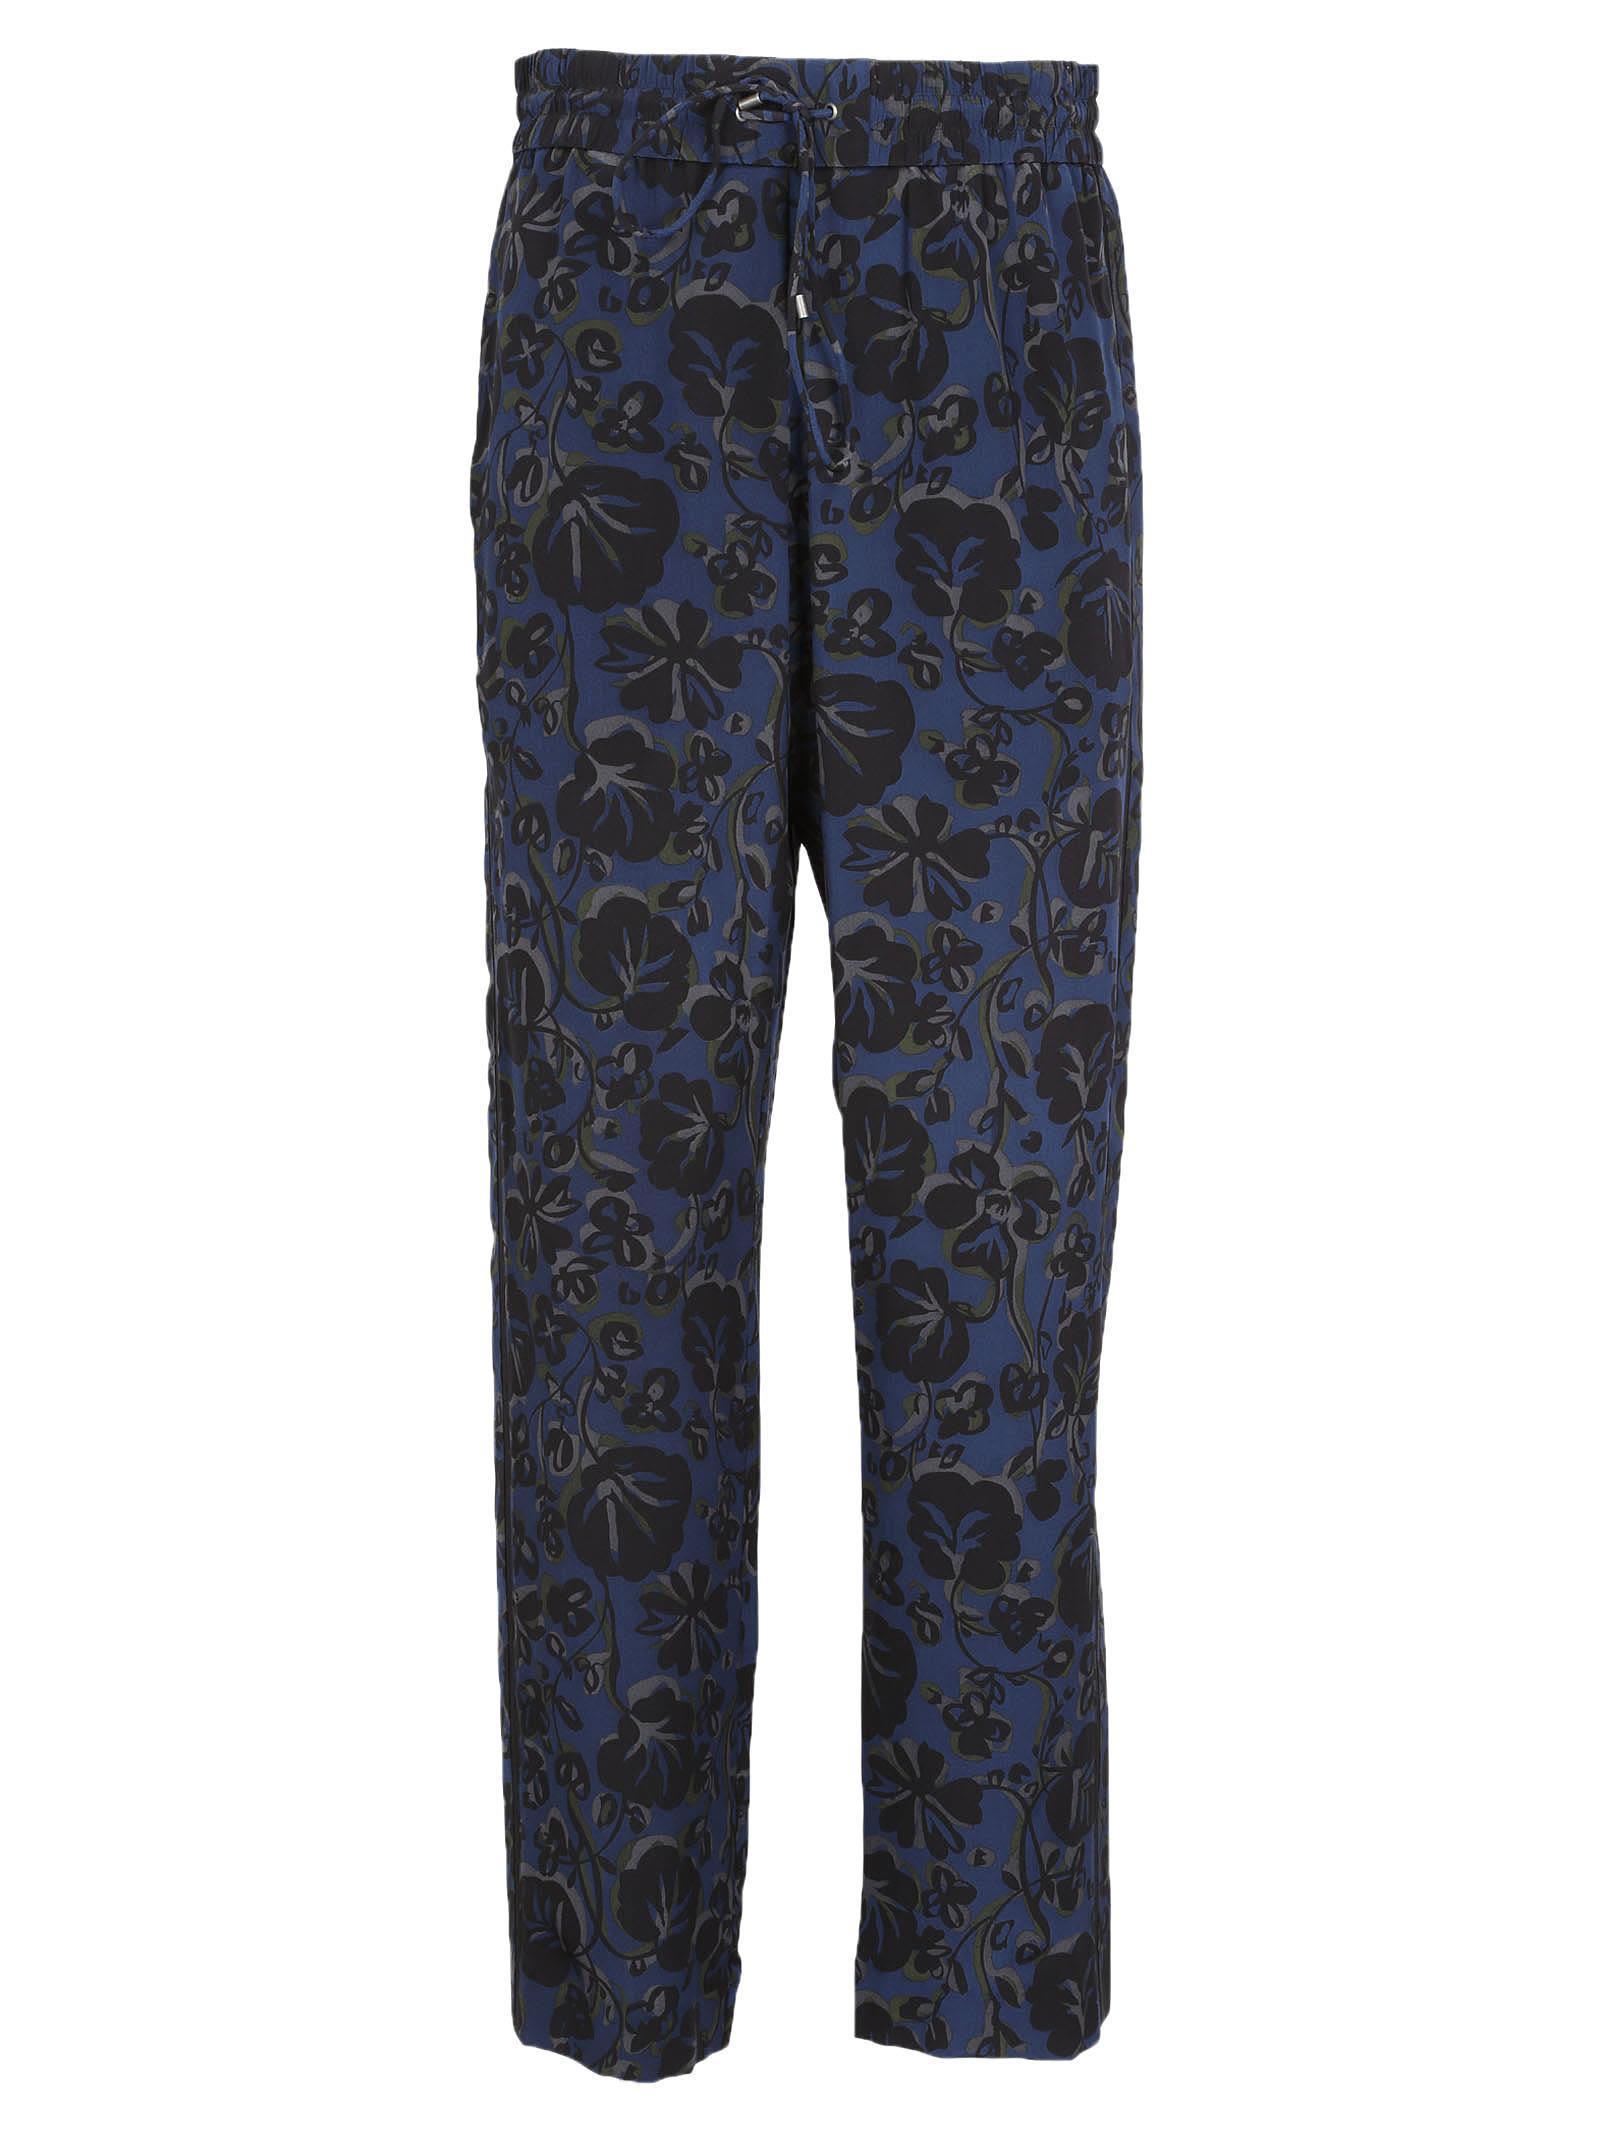 Kenzo Printed Track Pants